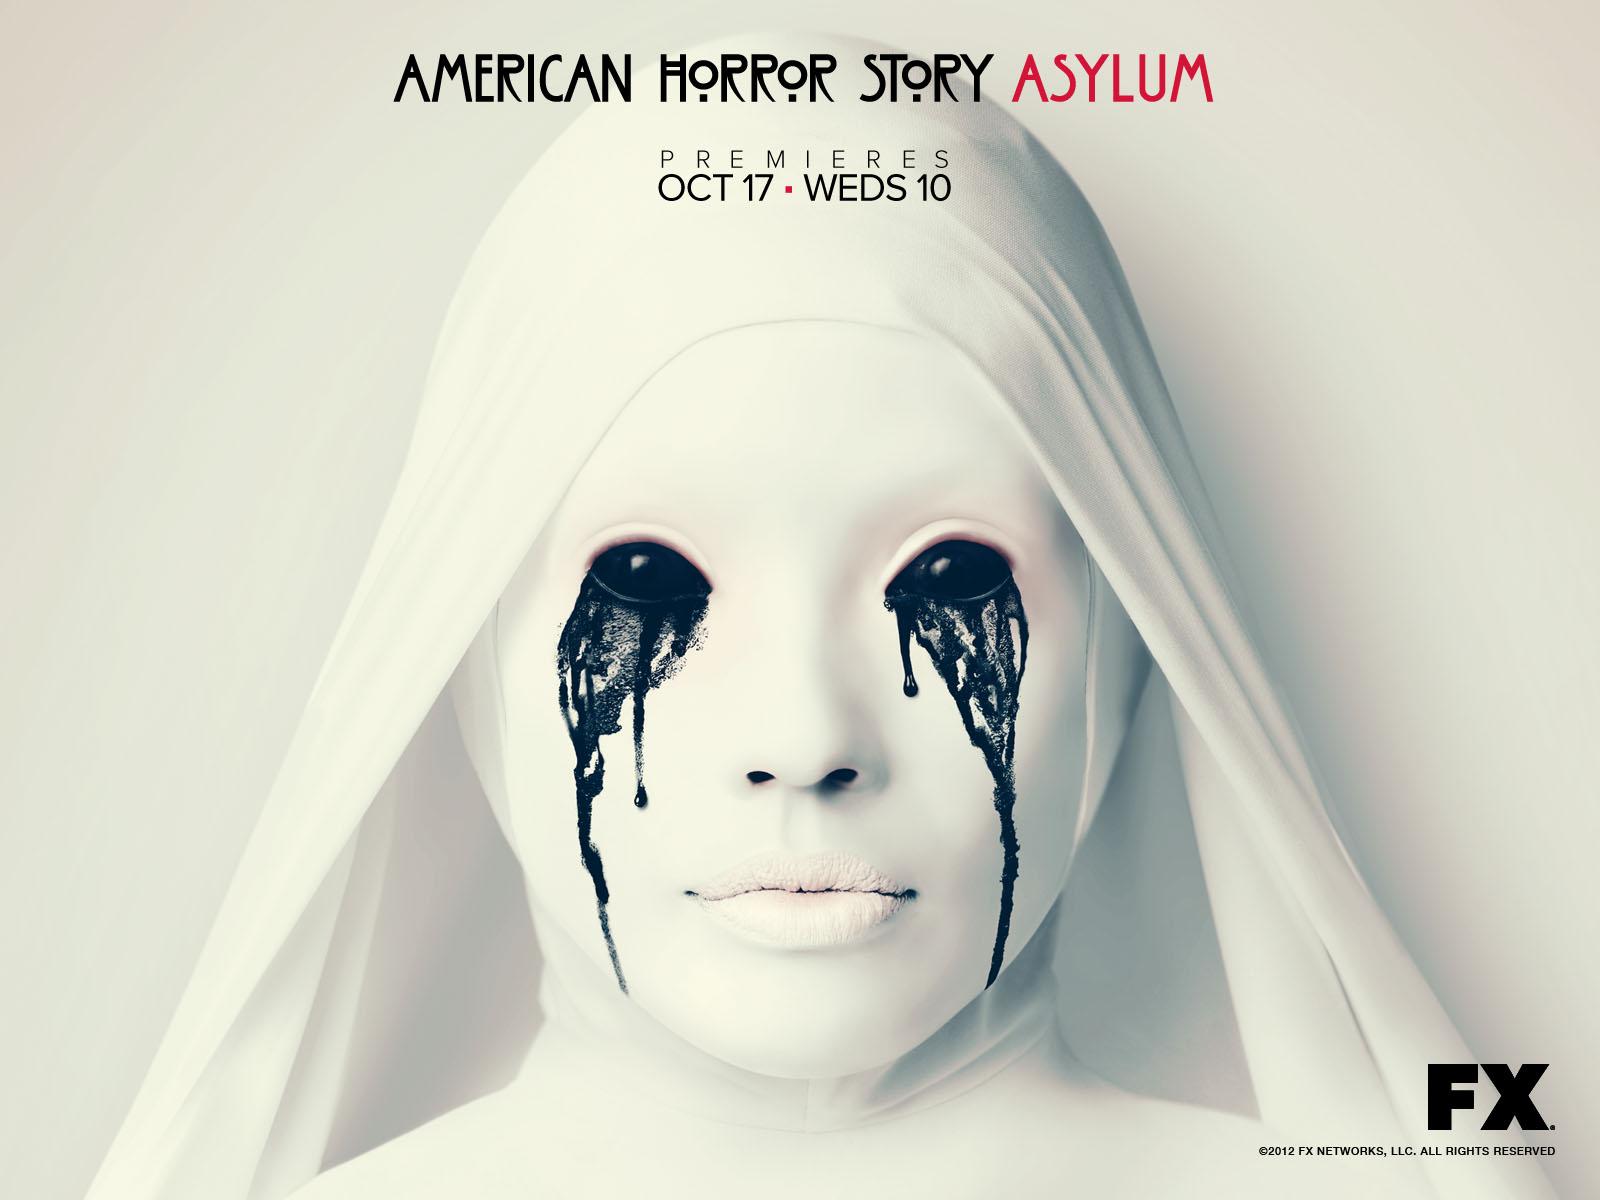 http://3.bp.blogspot.com/-Y787DP9VIkU/UX_Ym3md35I/AAAAAAAAuEw/BPZqk5u3hd4/s1600/American-Horror-Story-Asylum-wallpaper+hd.jpg